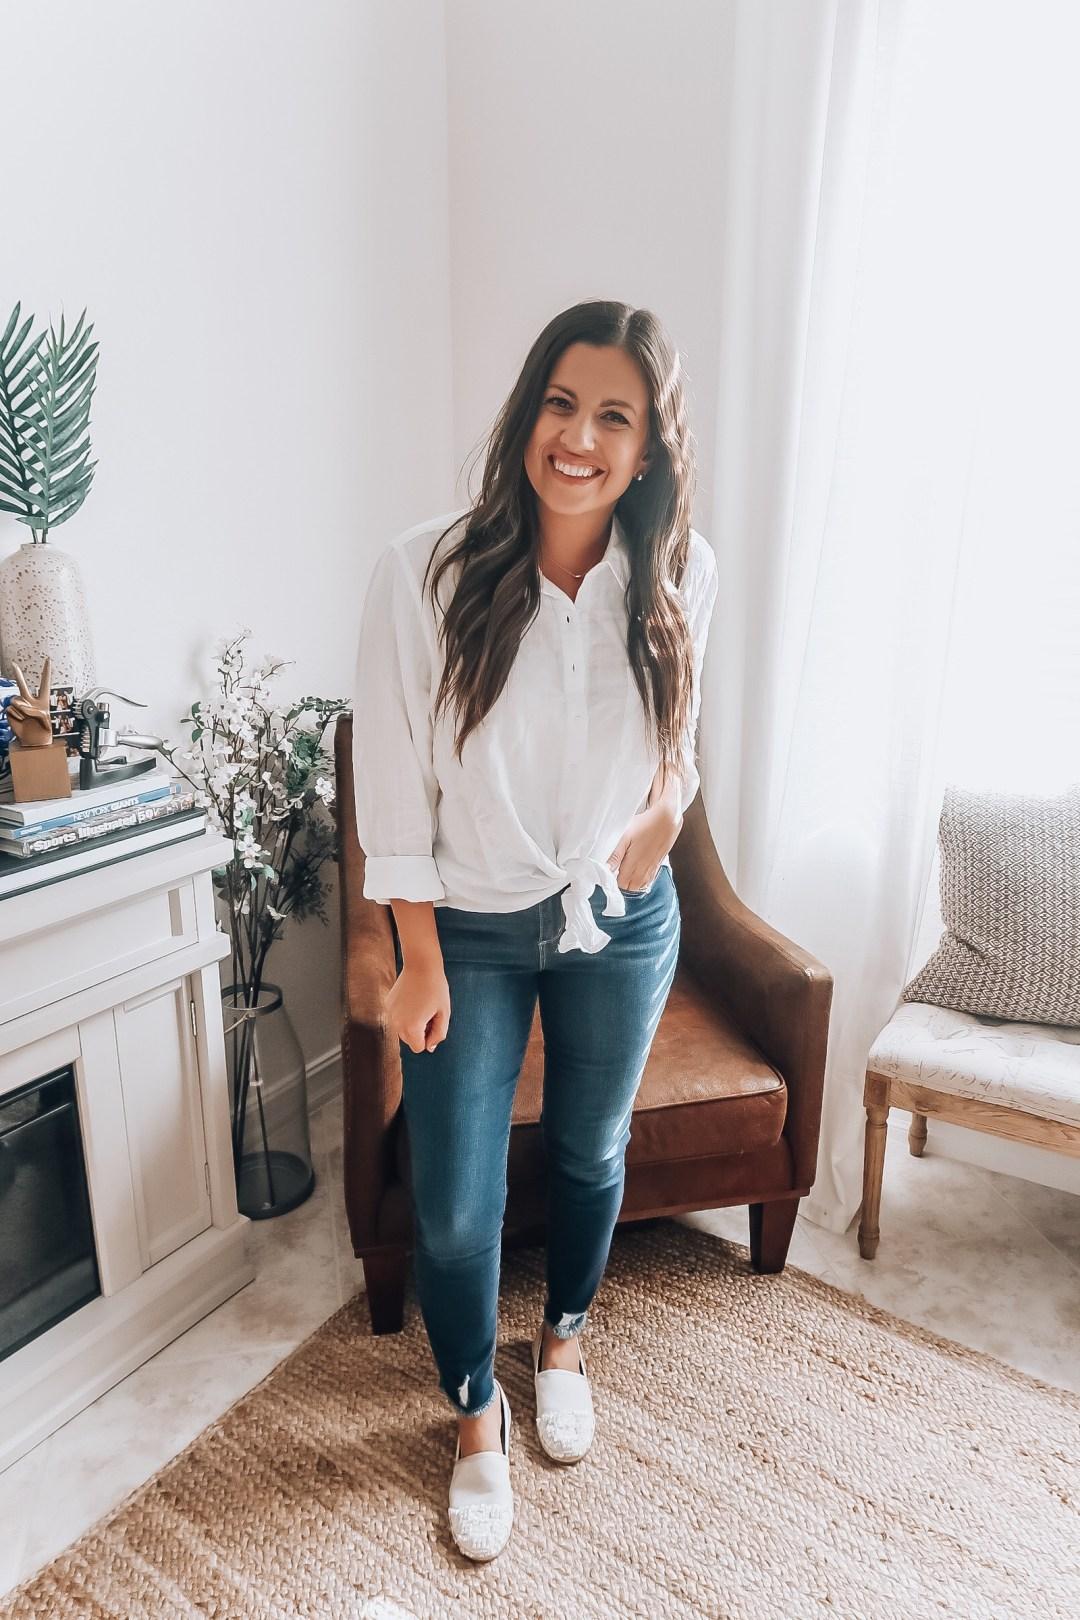 Walmart Fashion, Sofia Vergara jeans, affordable fashion blogger Jaime Cittadino